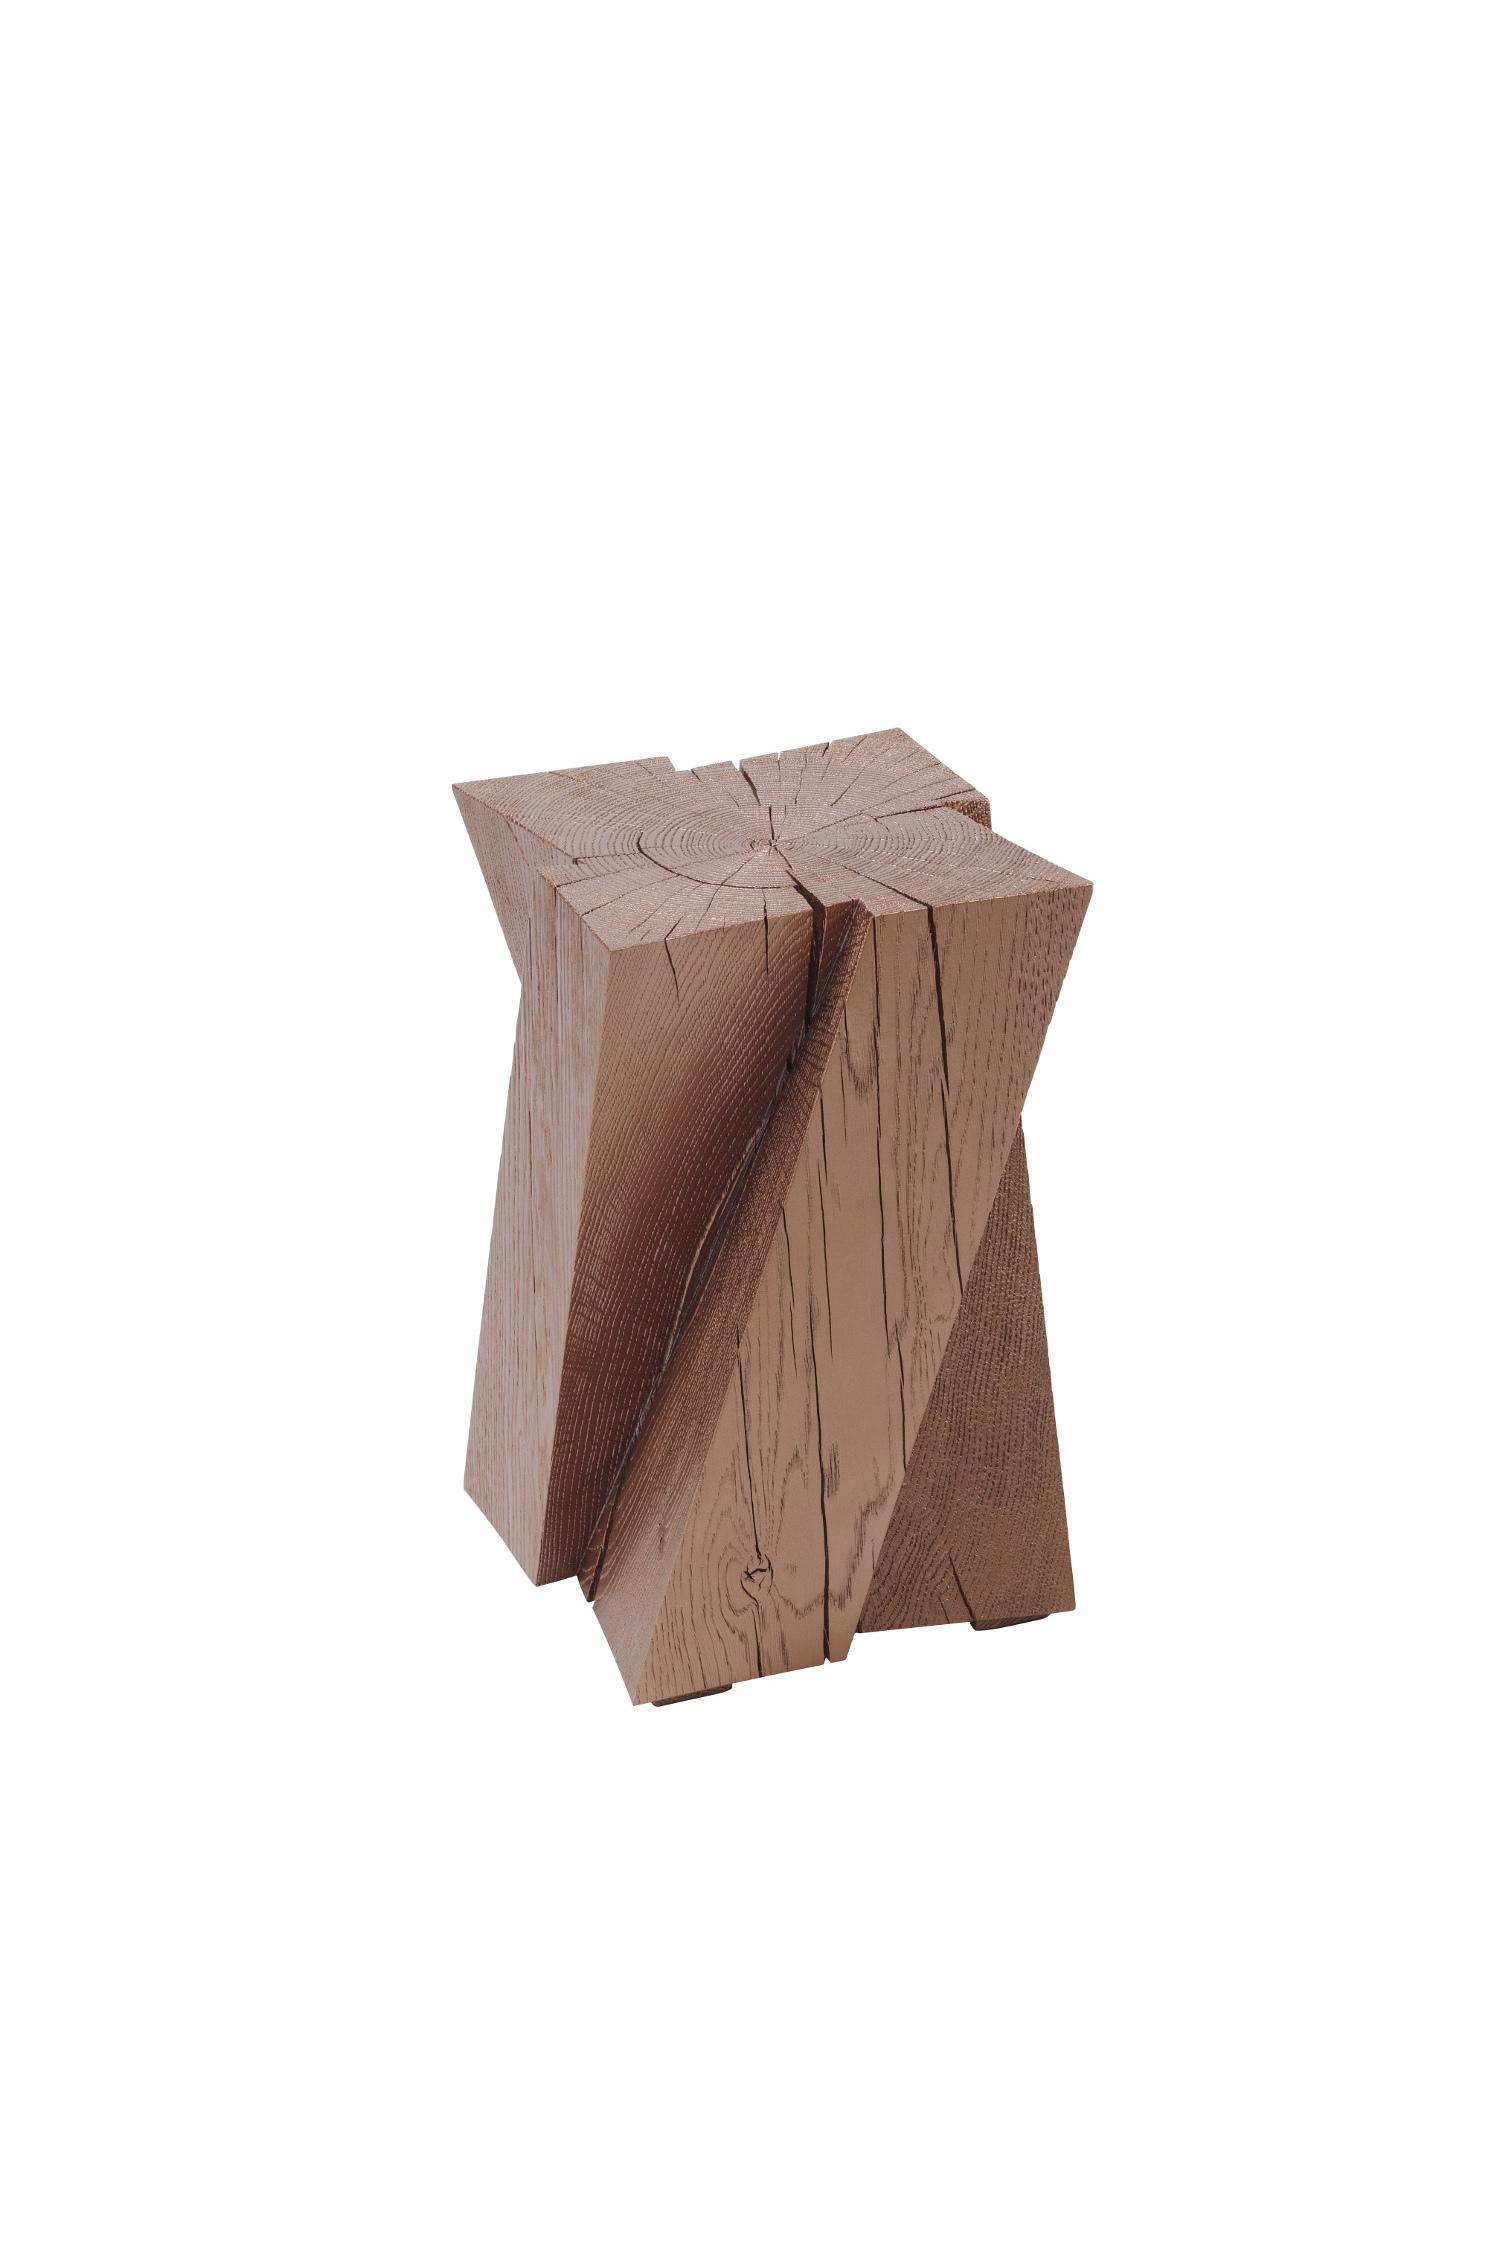 zigi - Pedestal —